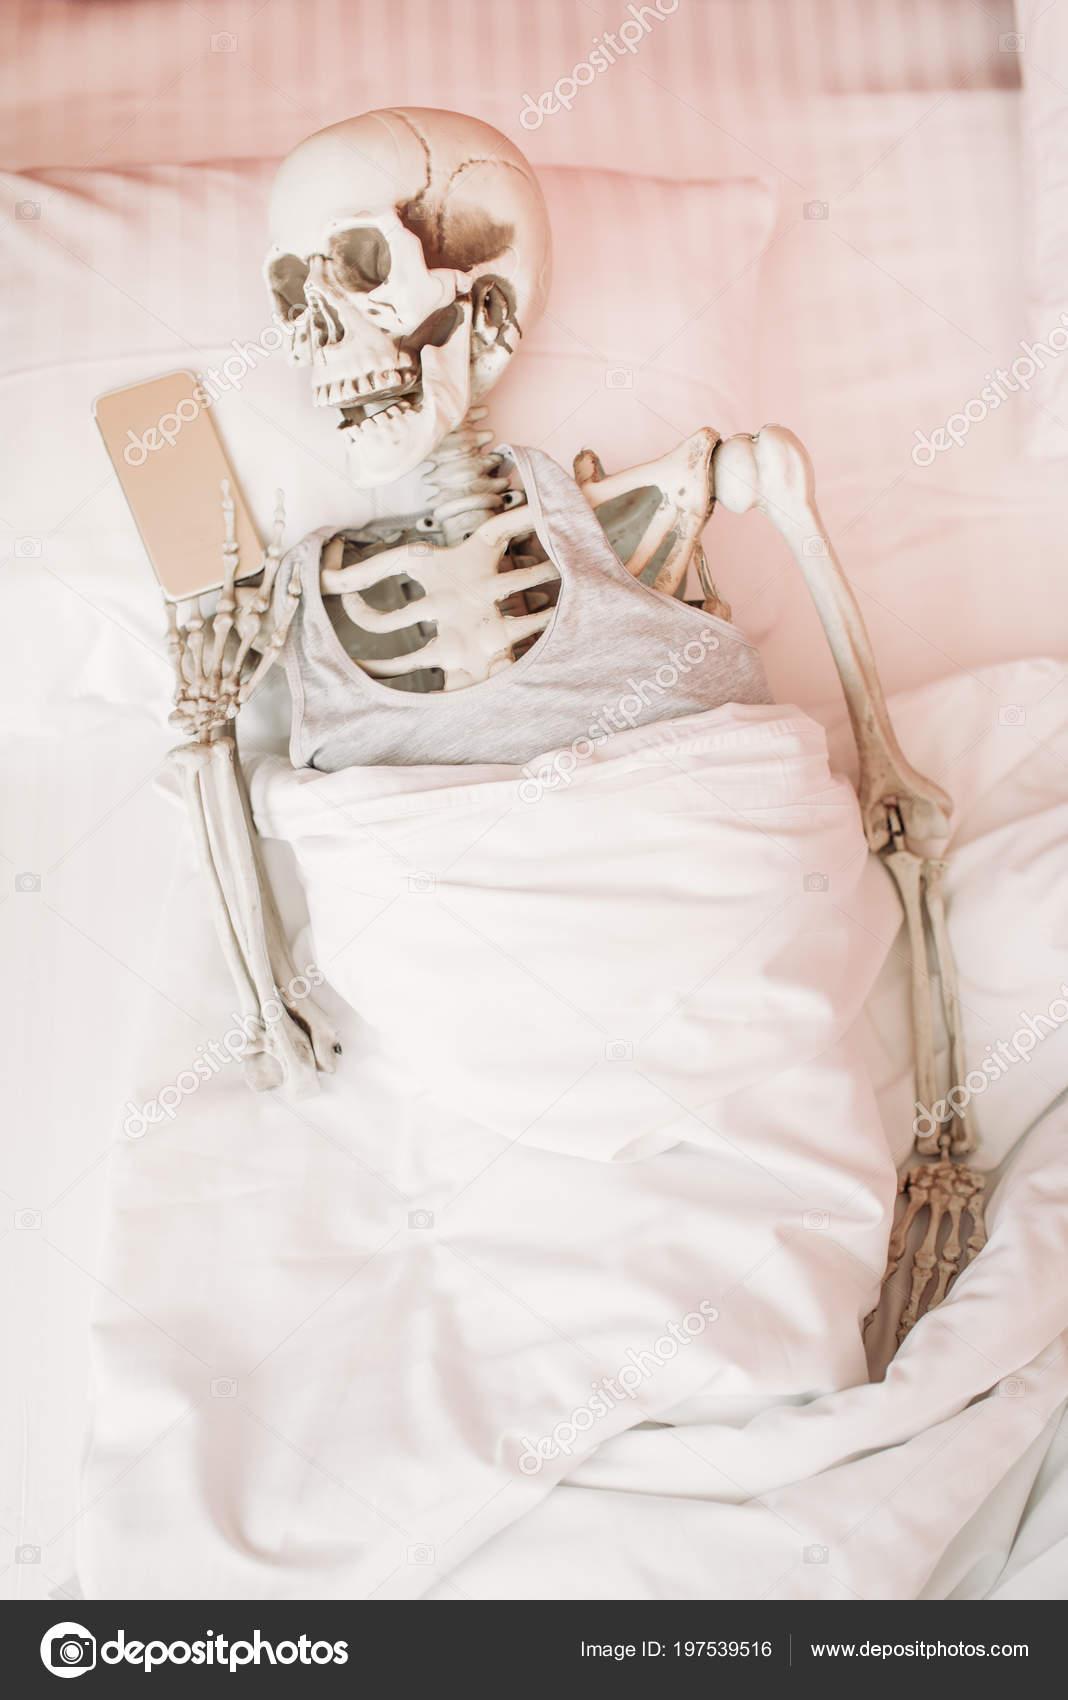 Esqueleto Humano Con Teléfono Móvil Mano Tumbado Cama Divertida ...